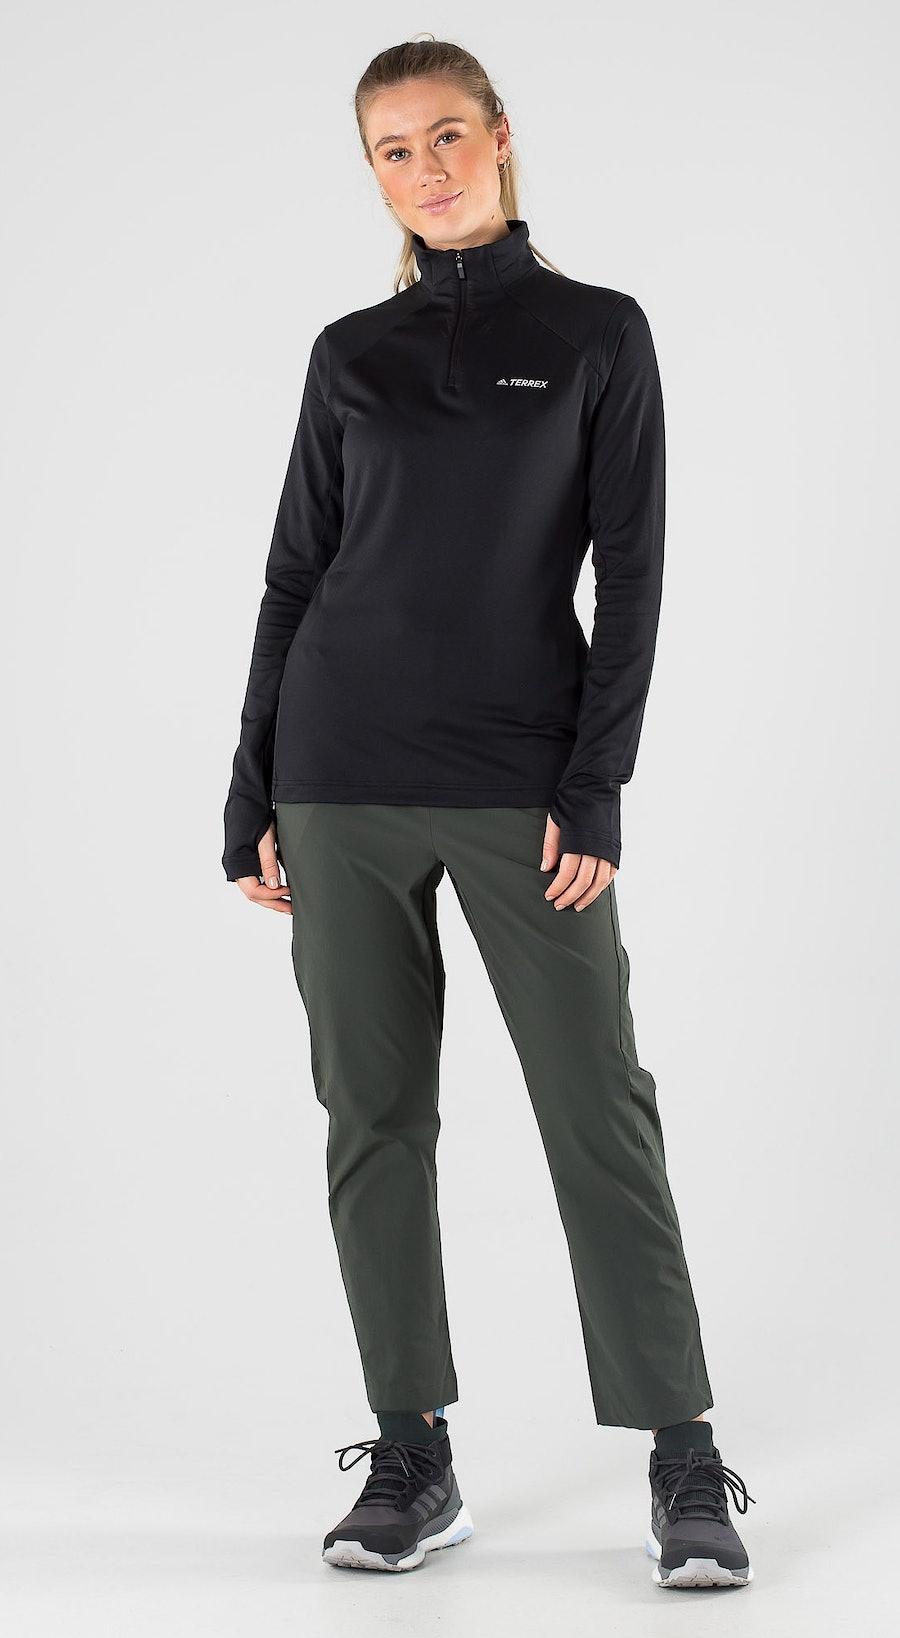 Adidas Terrex EveryH 1/2 Zip Black Outfit Multi